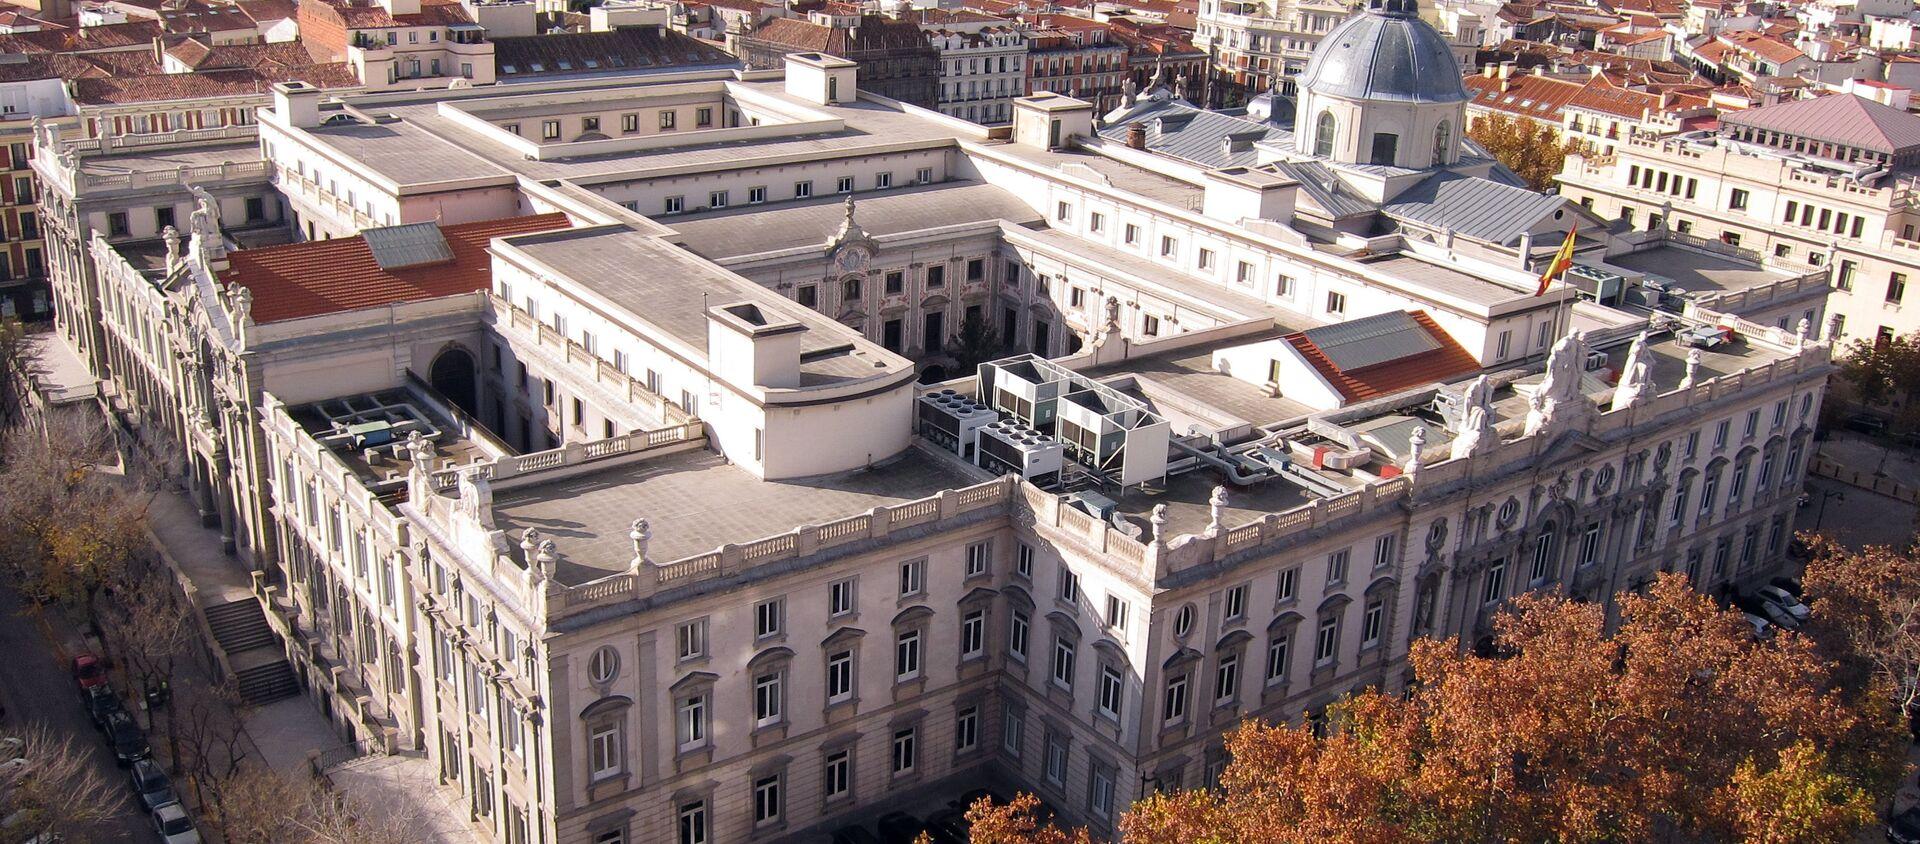 Tribunal Supremo de España en Madrid (vista aérea) - Sputnik Mundo, 1920, 14.10.2020